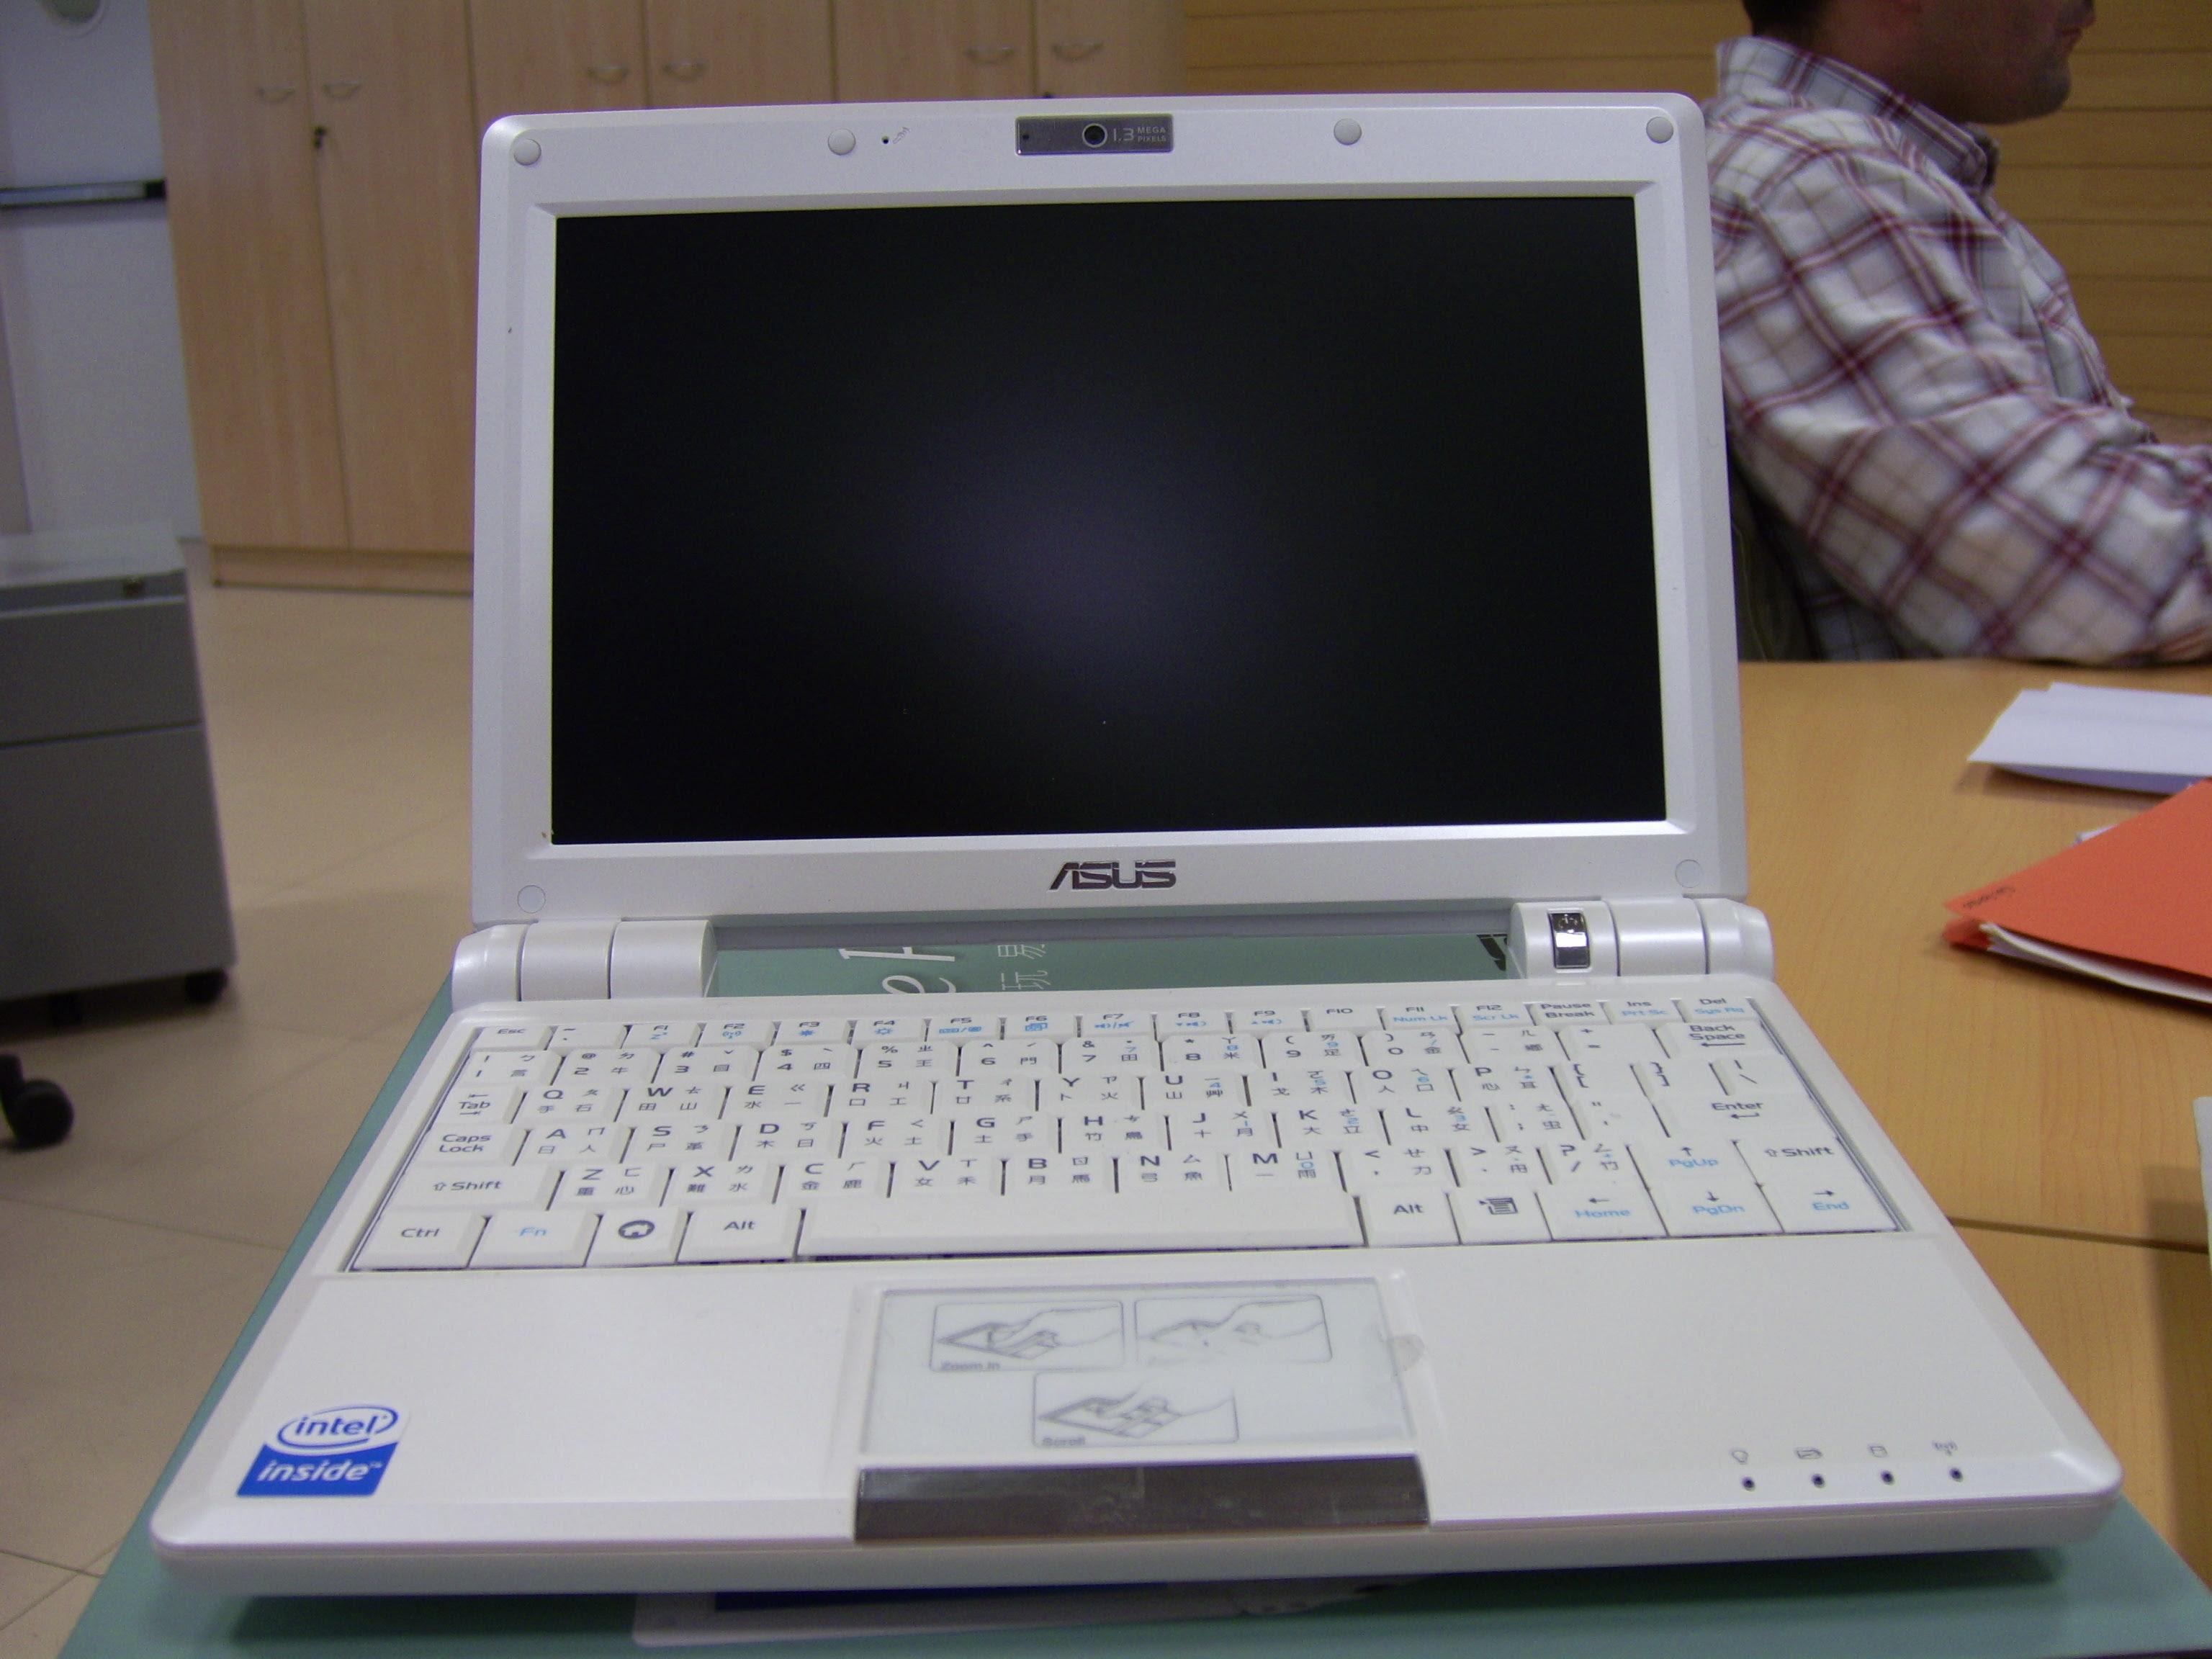 Harga Keyboard Netbook Asus Eee Pc 1005ha Laptop Notebookasus Eeepc Seashell Sea Shell 1001 1001ha 1001p 1001px 1001pe 1005 1005hab 1008 1008ha Hitam Fileasus 900 0010 Wikimedia Commons